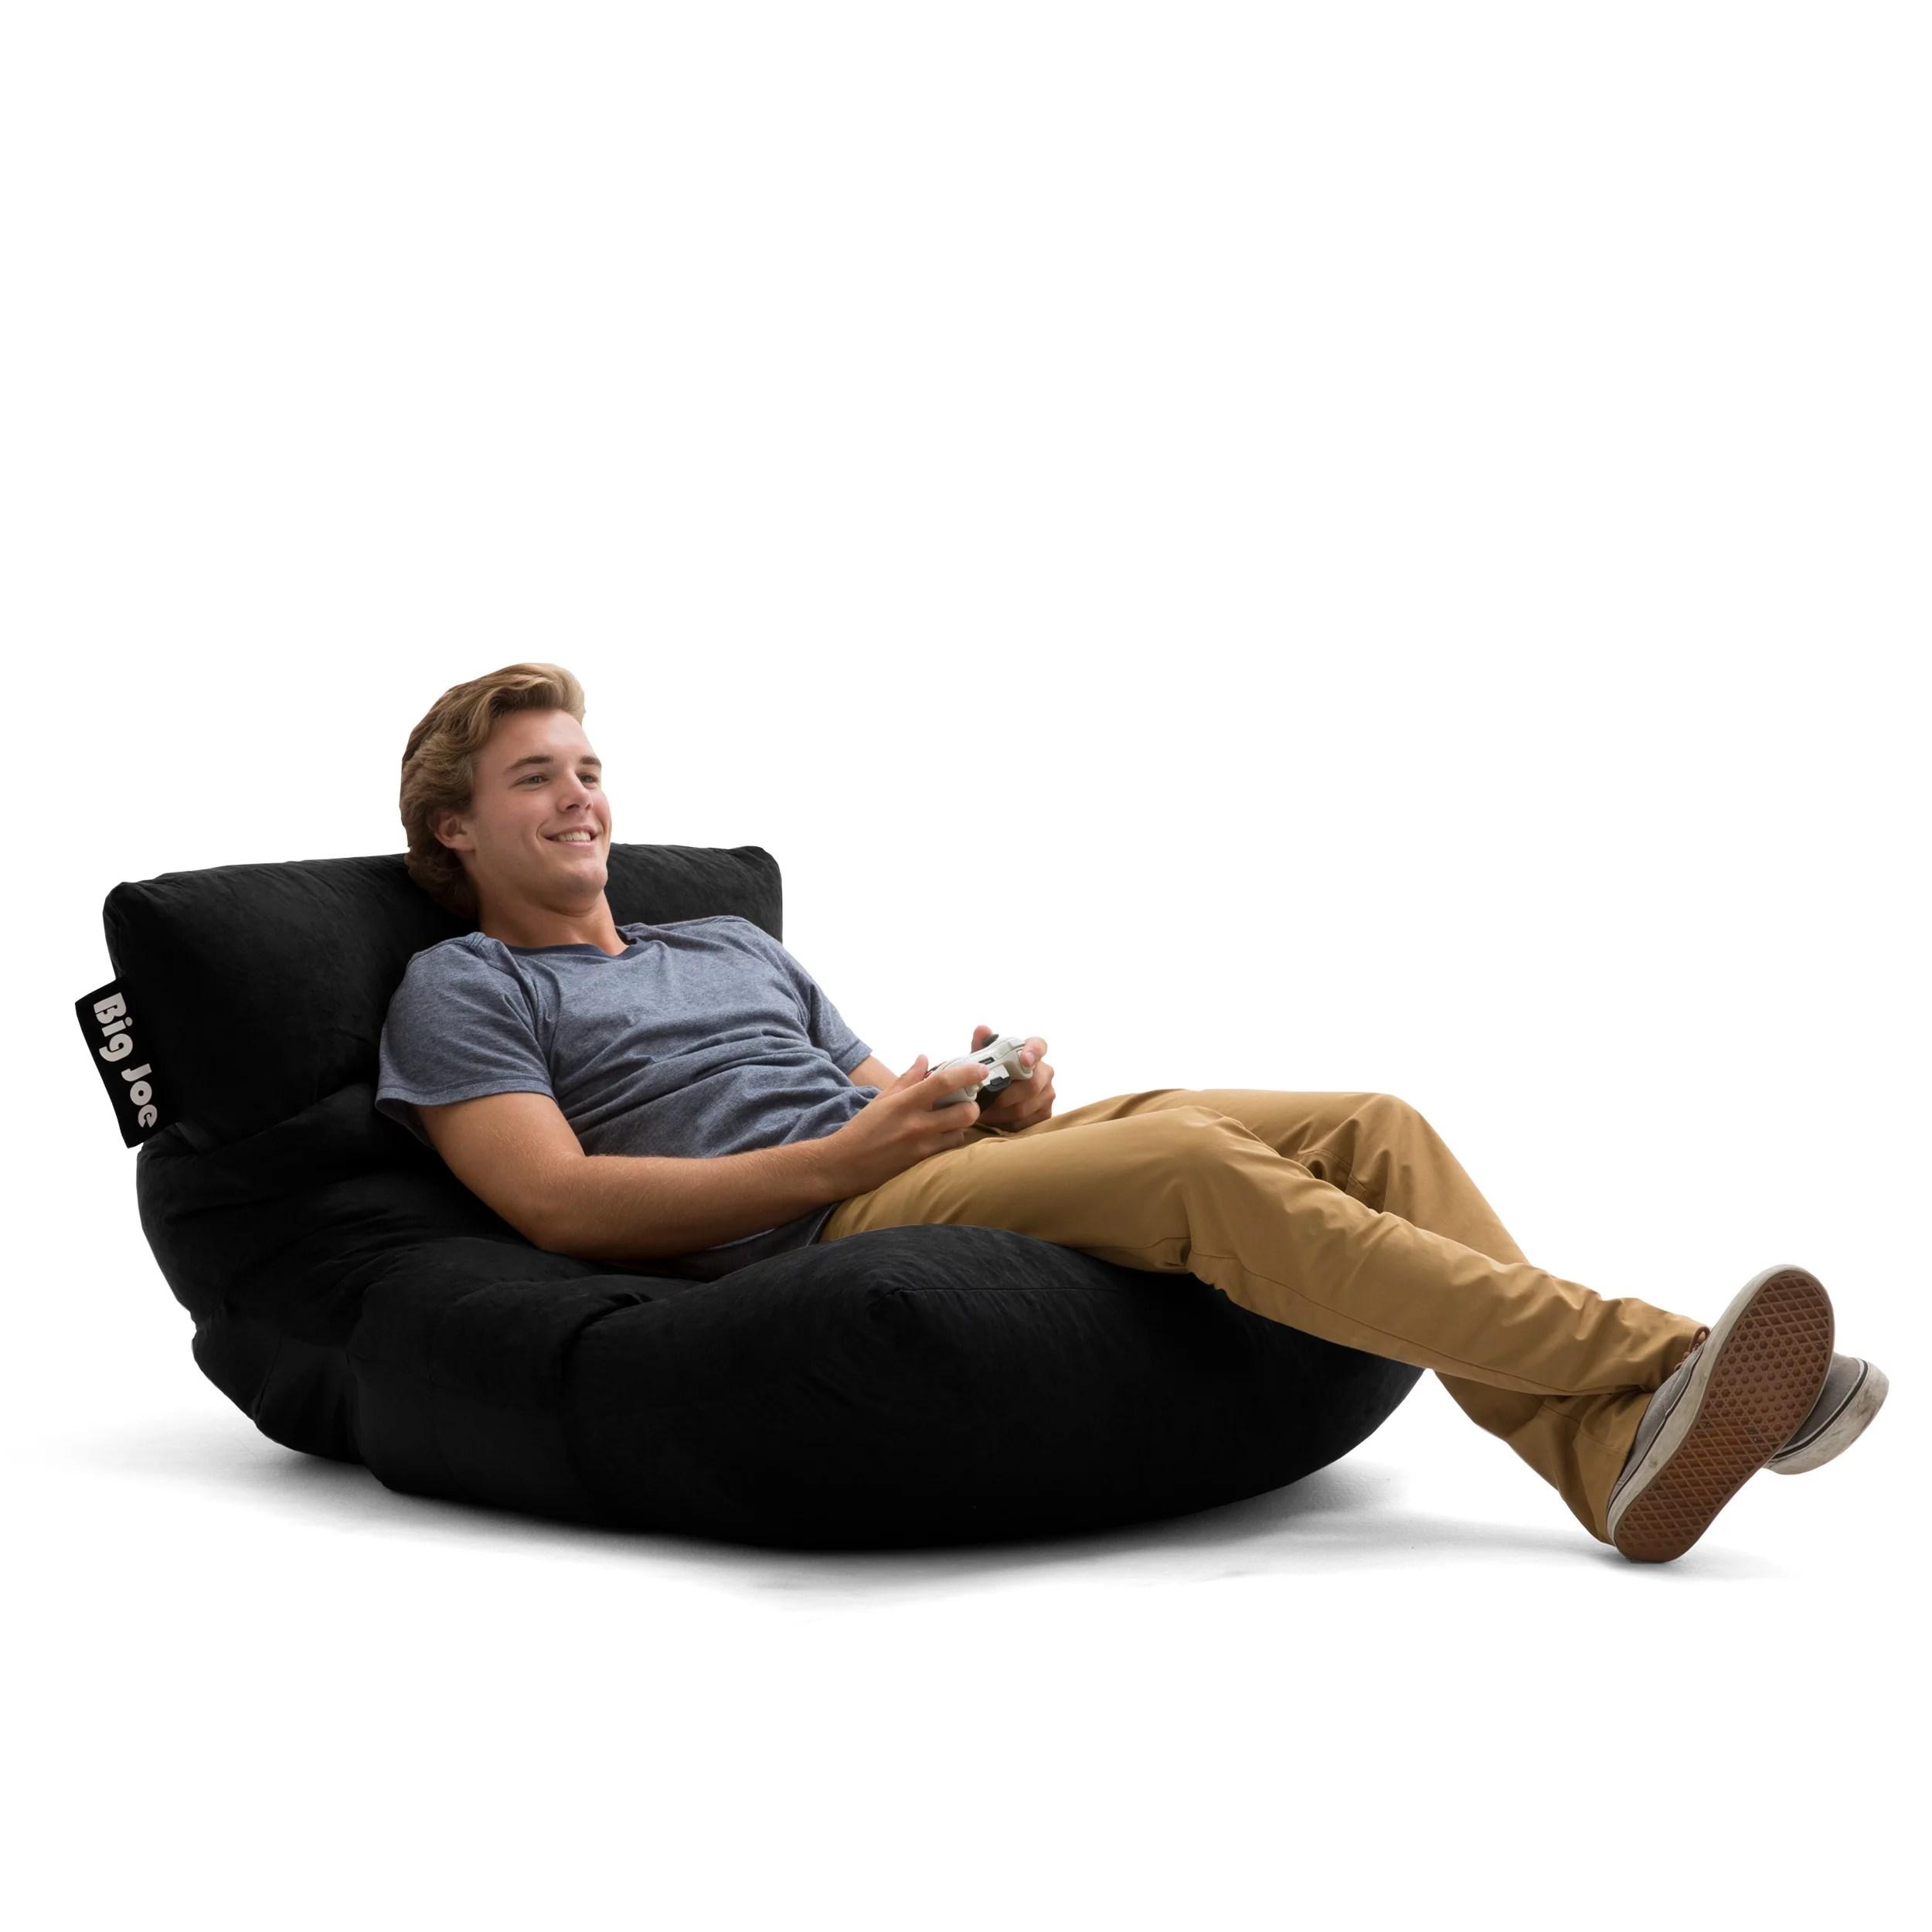 big joe roma lounge chair foldable aluminum sports floor bean bag multiple colors fabrics walmart com